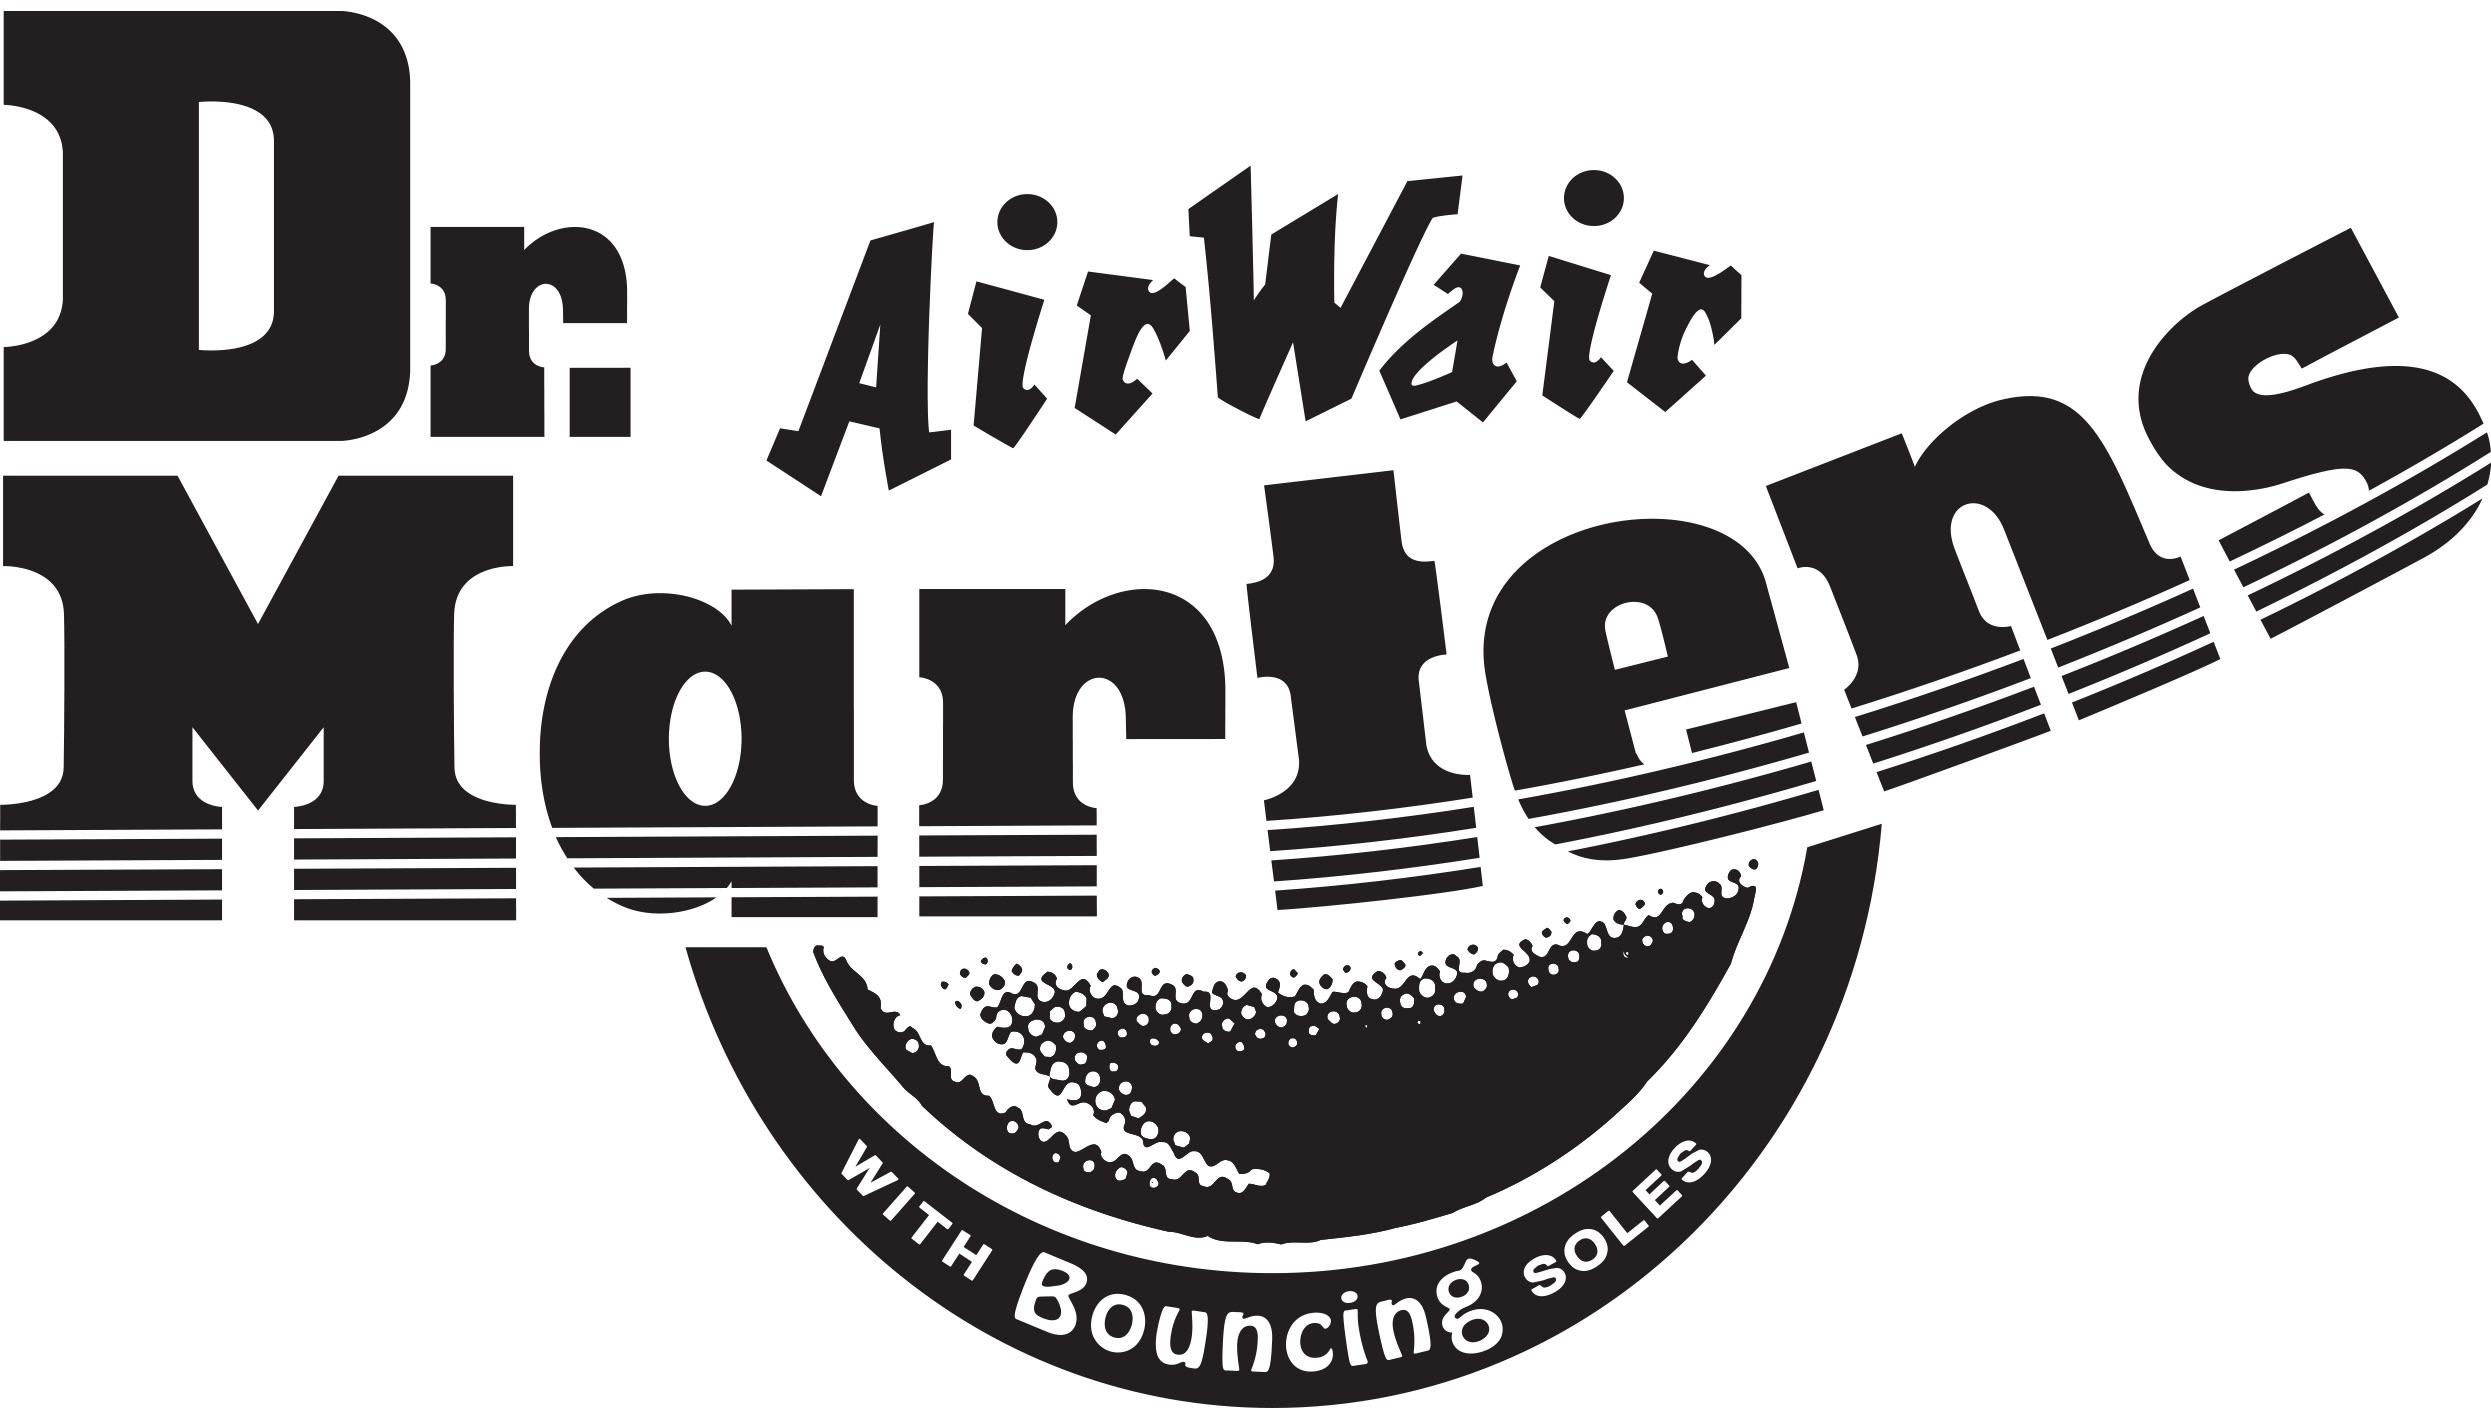 2_Dr_Martens_Black_Logo.jpg